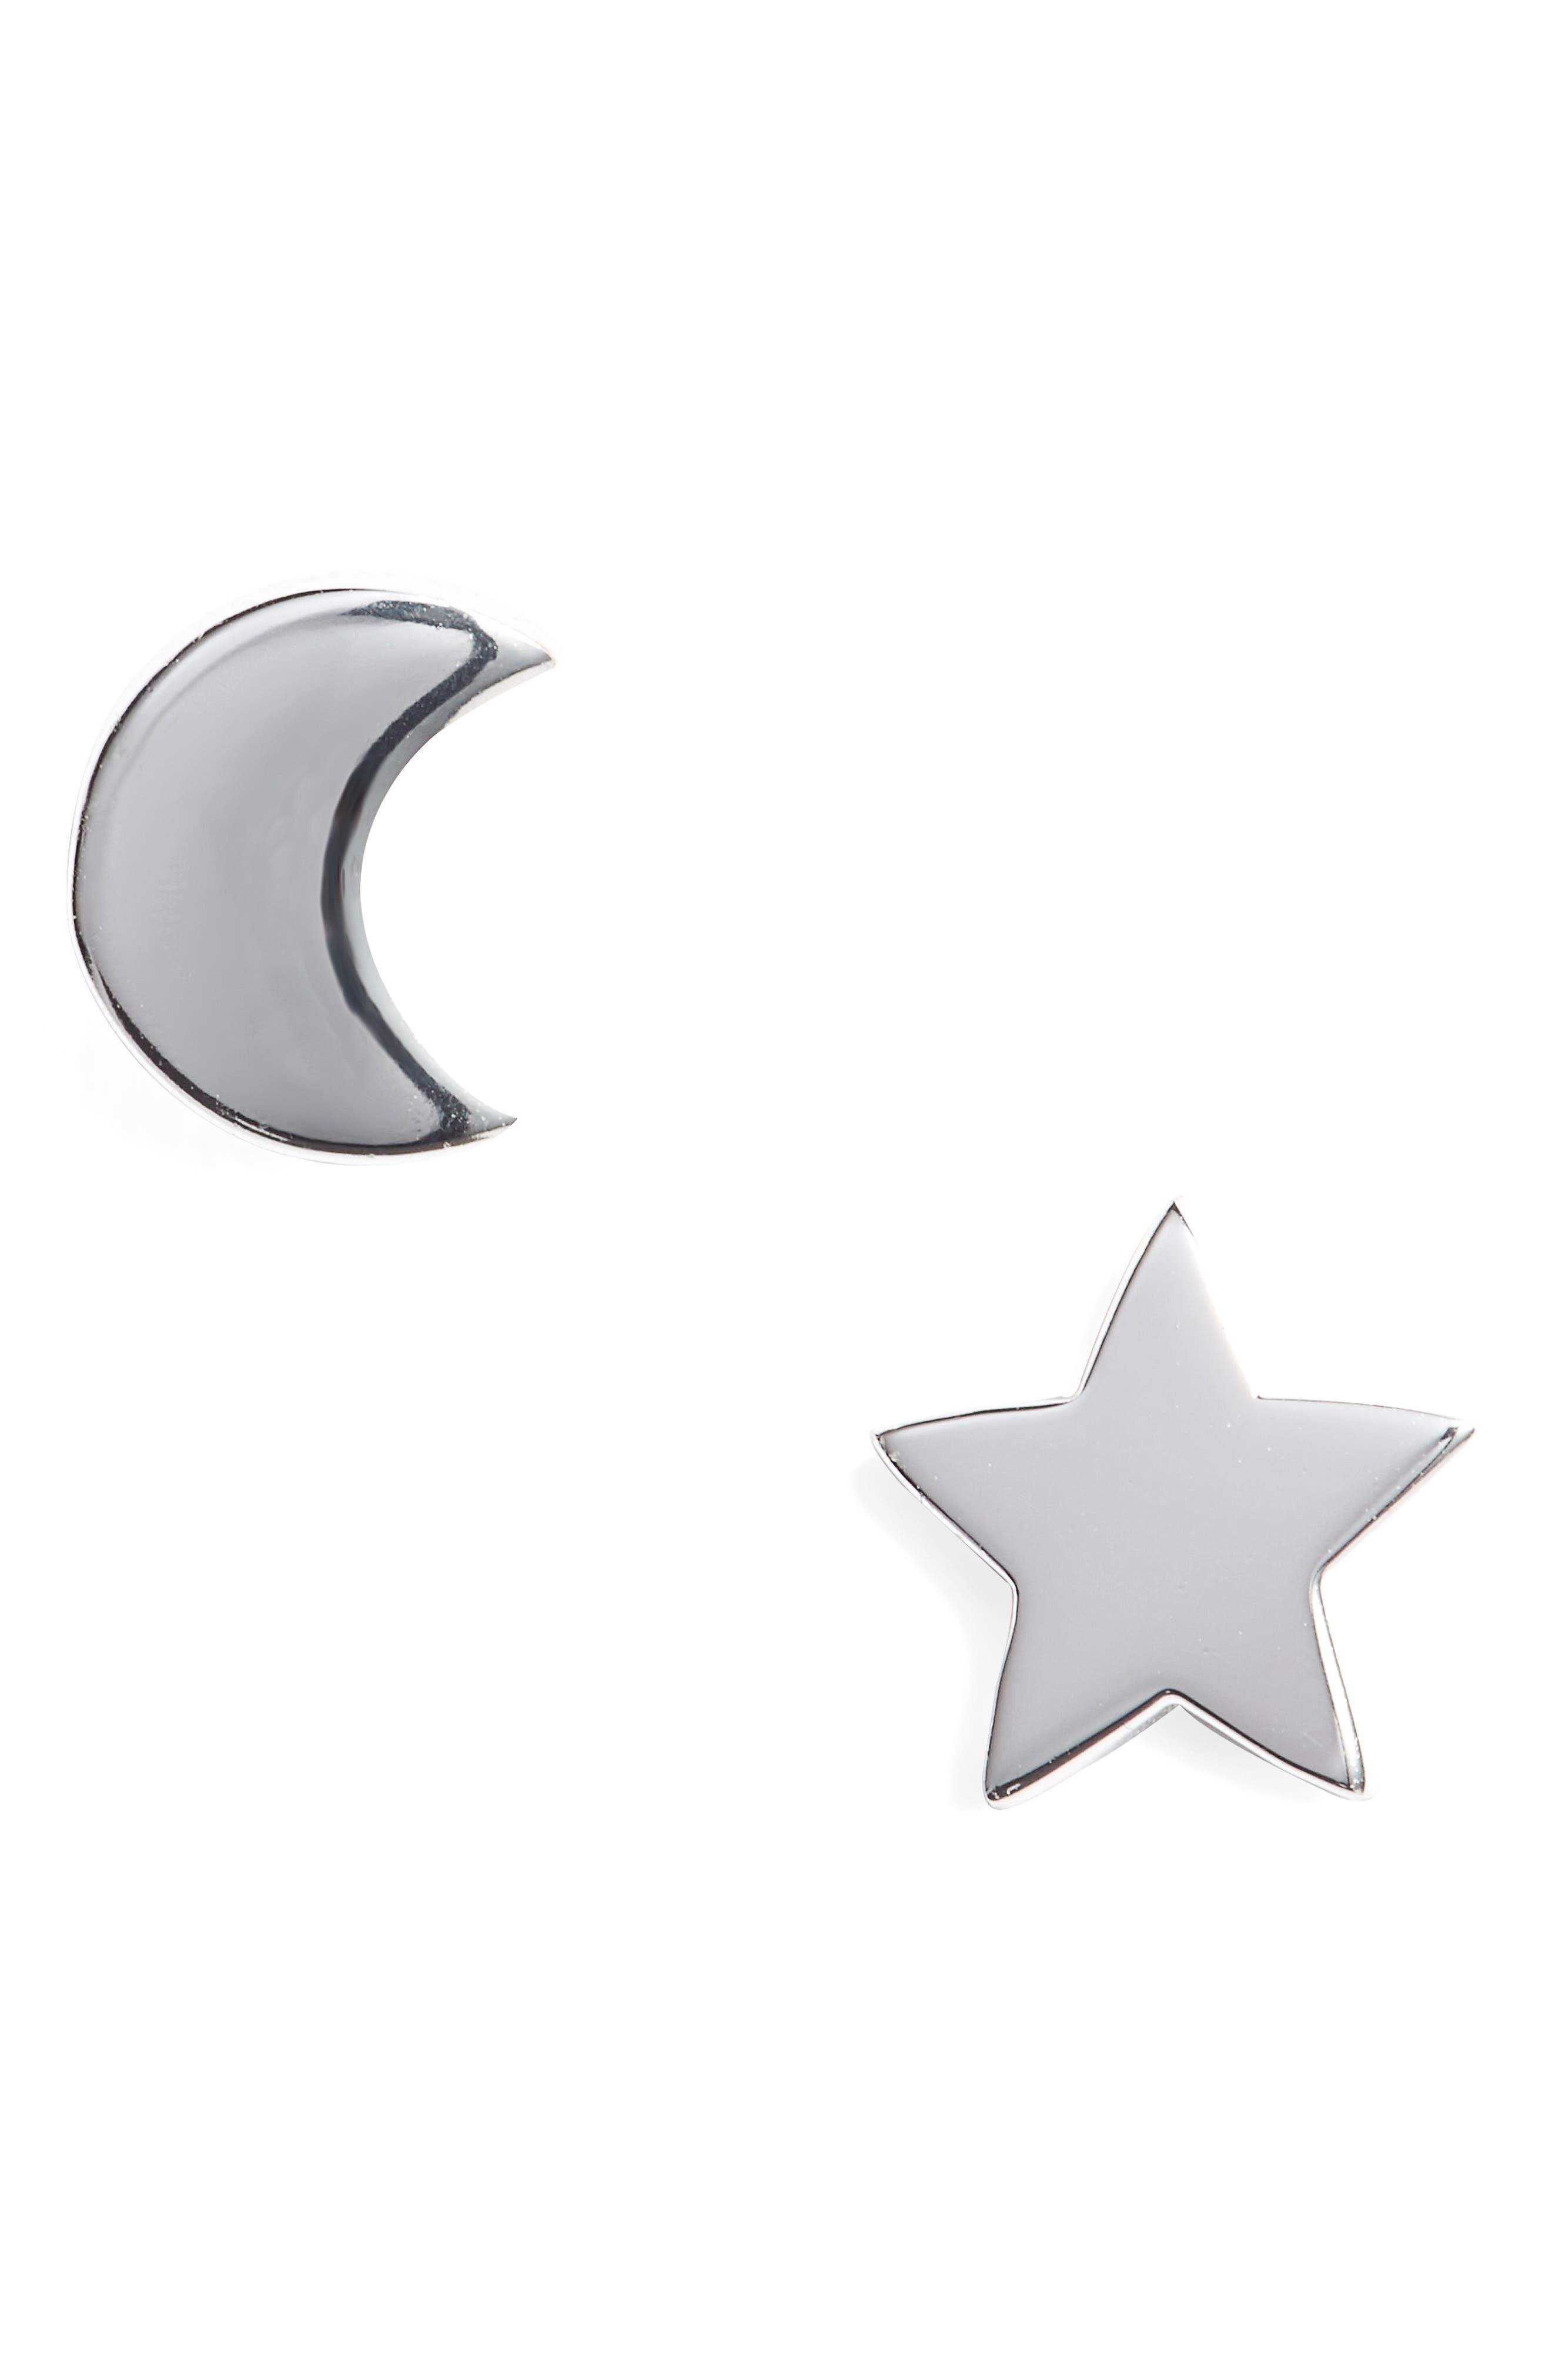 Alternate Image 1 Selected - Argento Vivo Moon & Star Stud Earrings